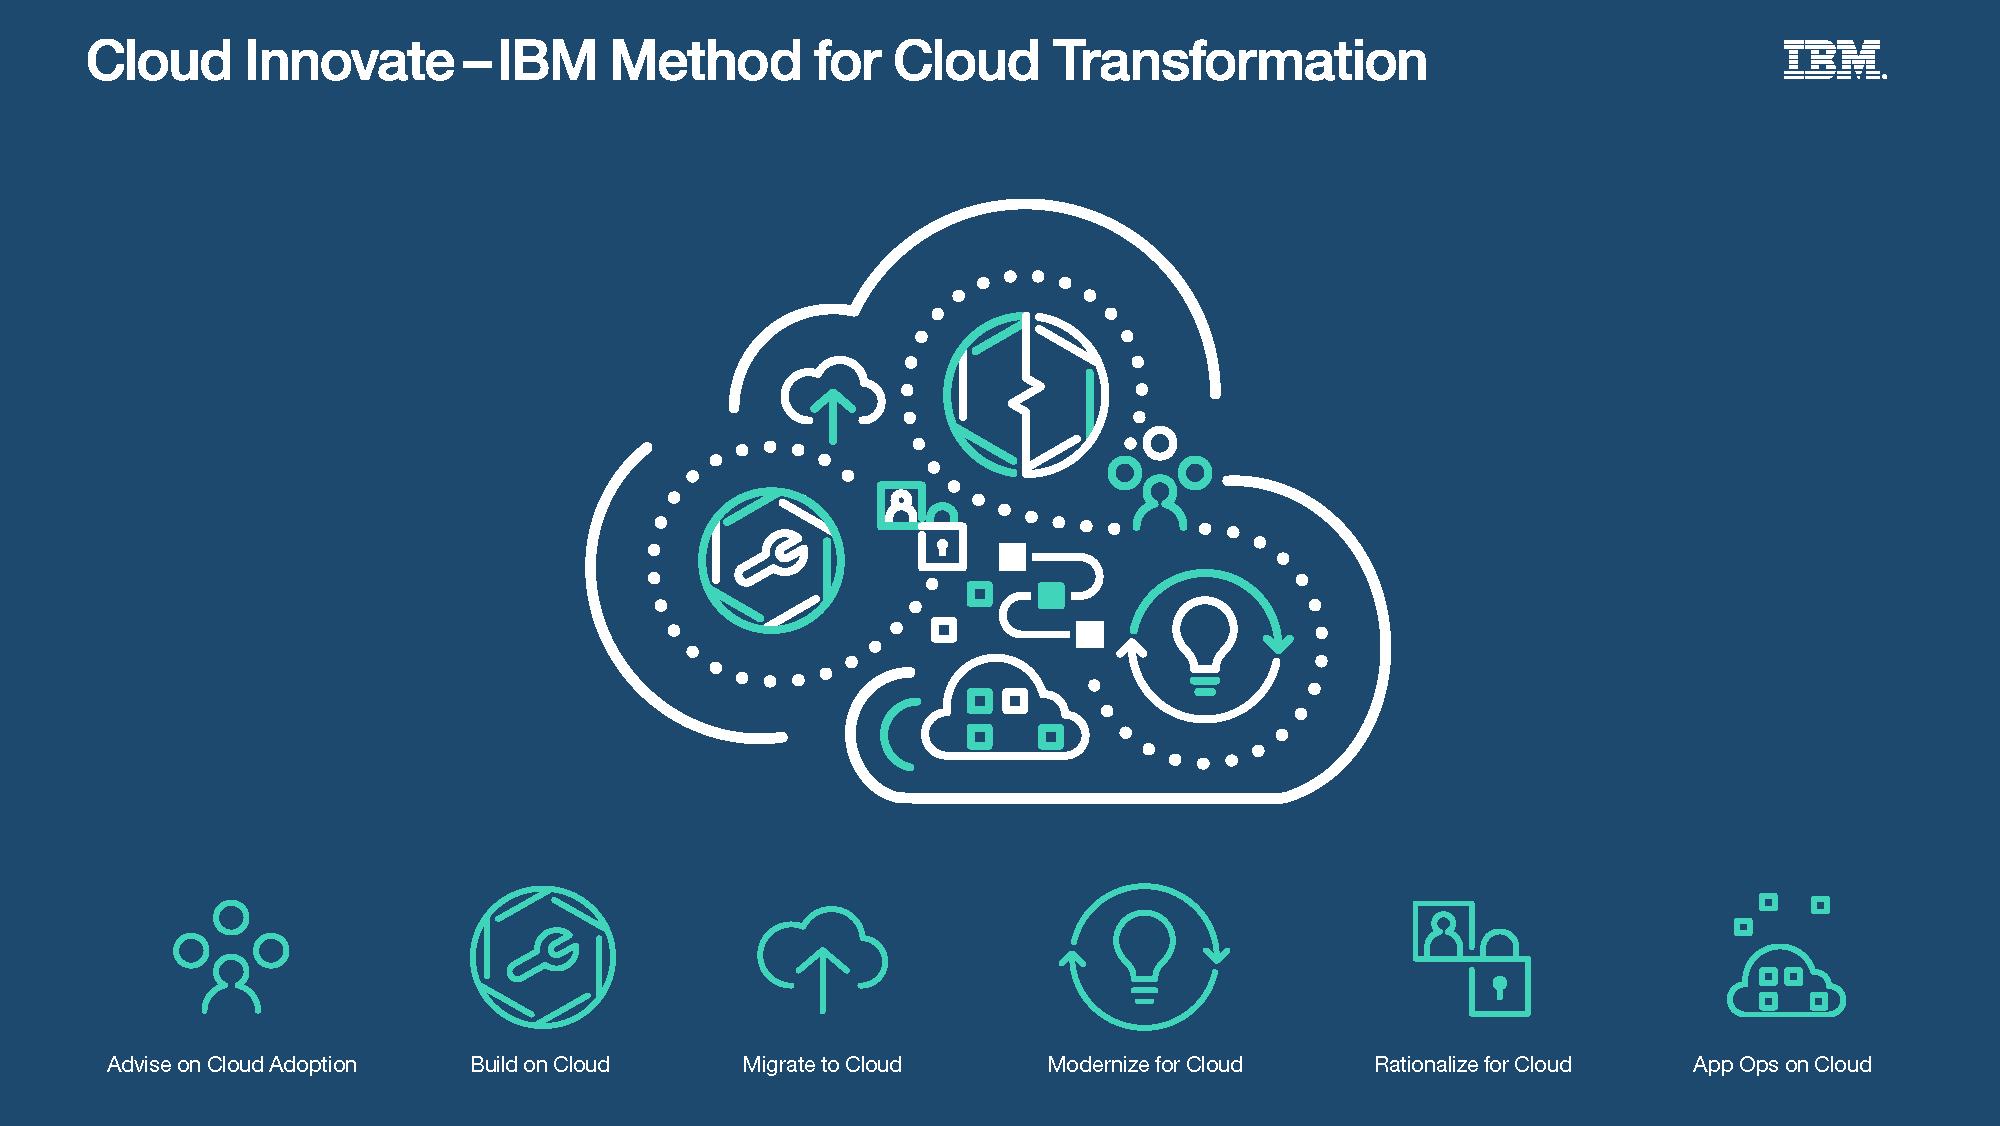 IBM Cloud Innovate Digital Poster